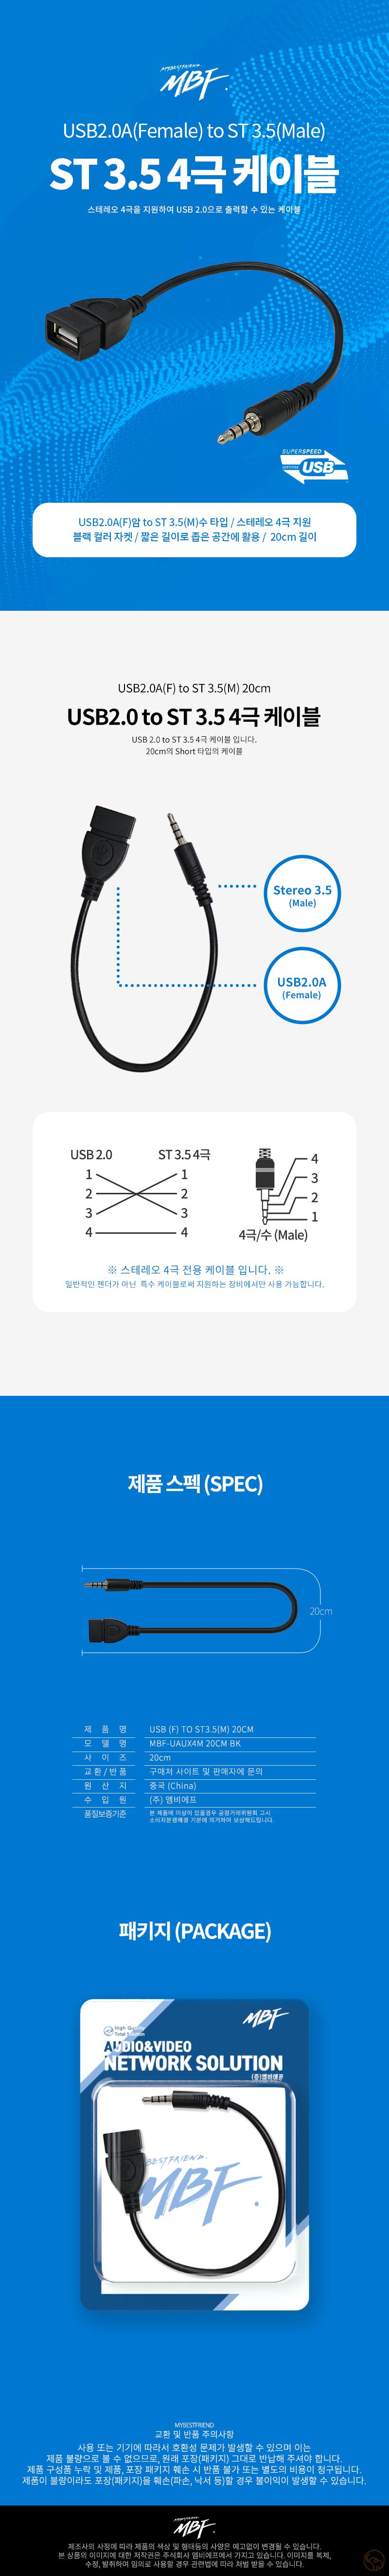 MBF MBF-UAUX4M USB(F) to 스테레오 3.5 4극 케이블 (0.2m)